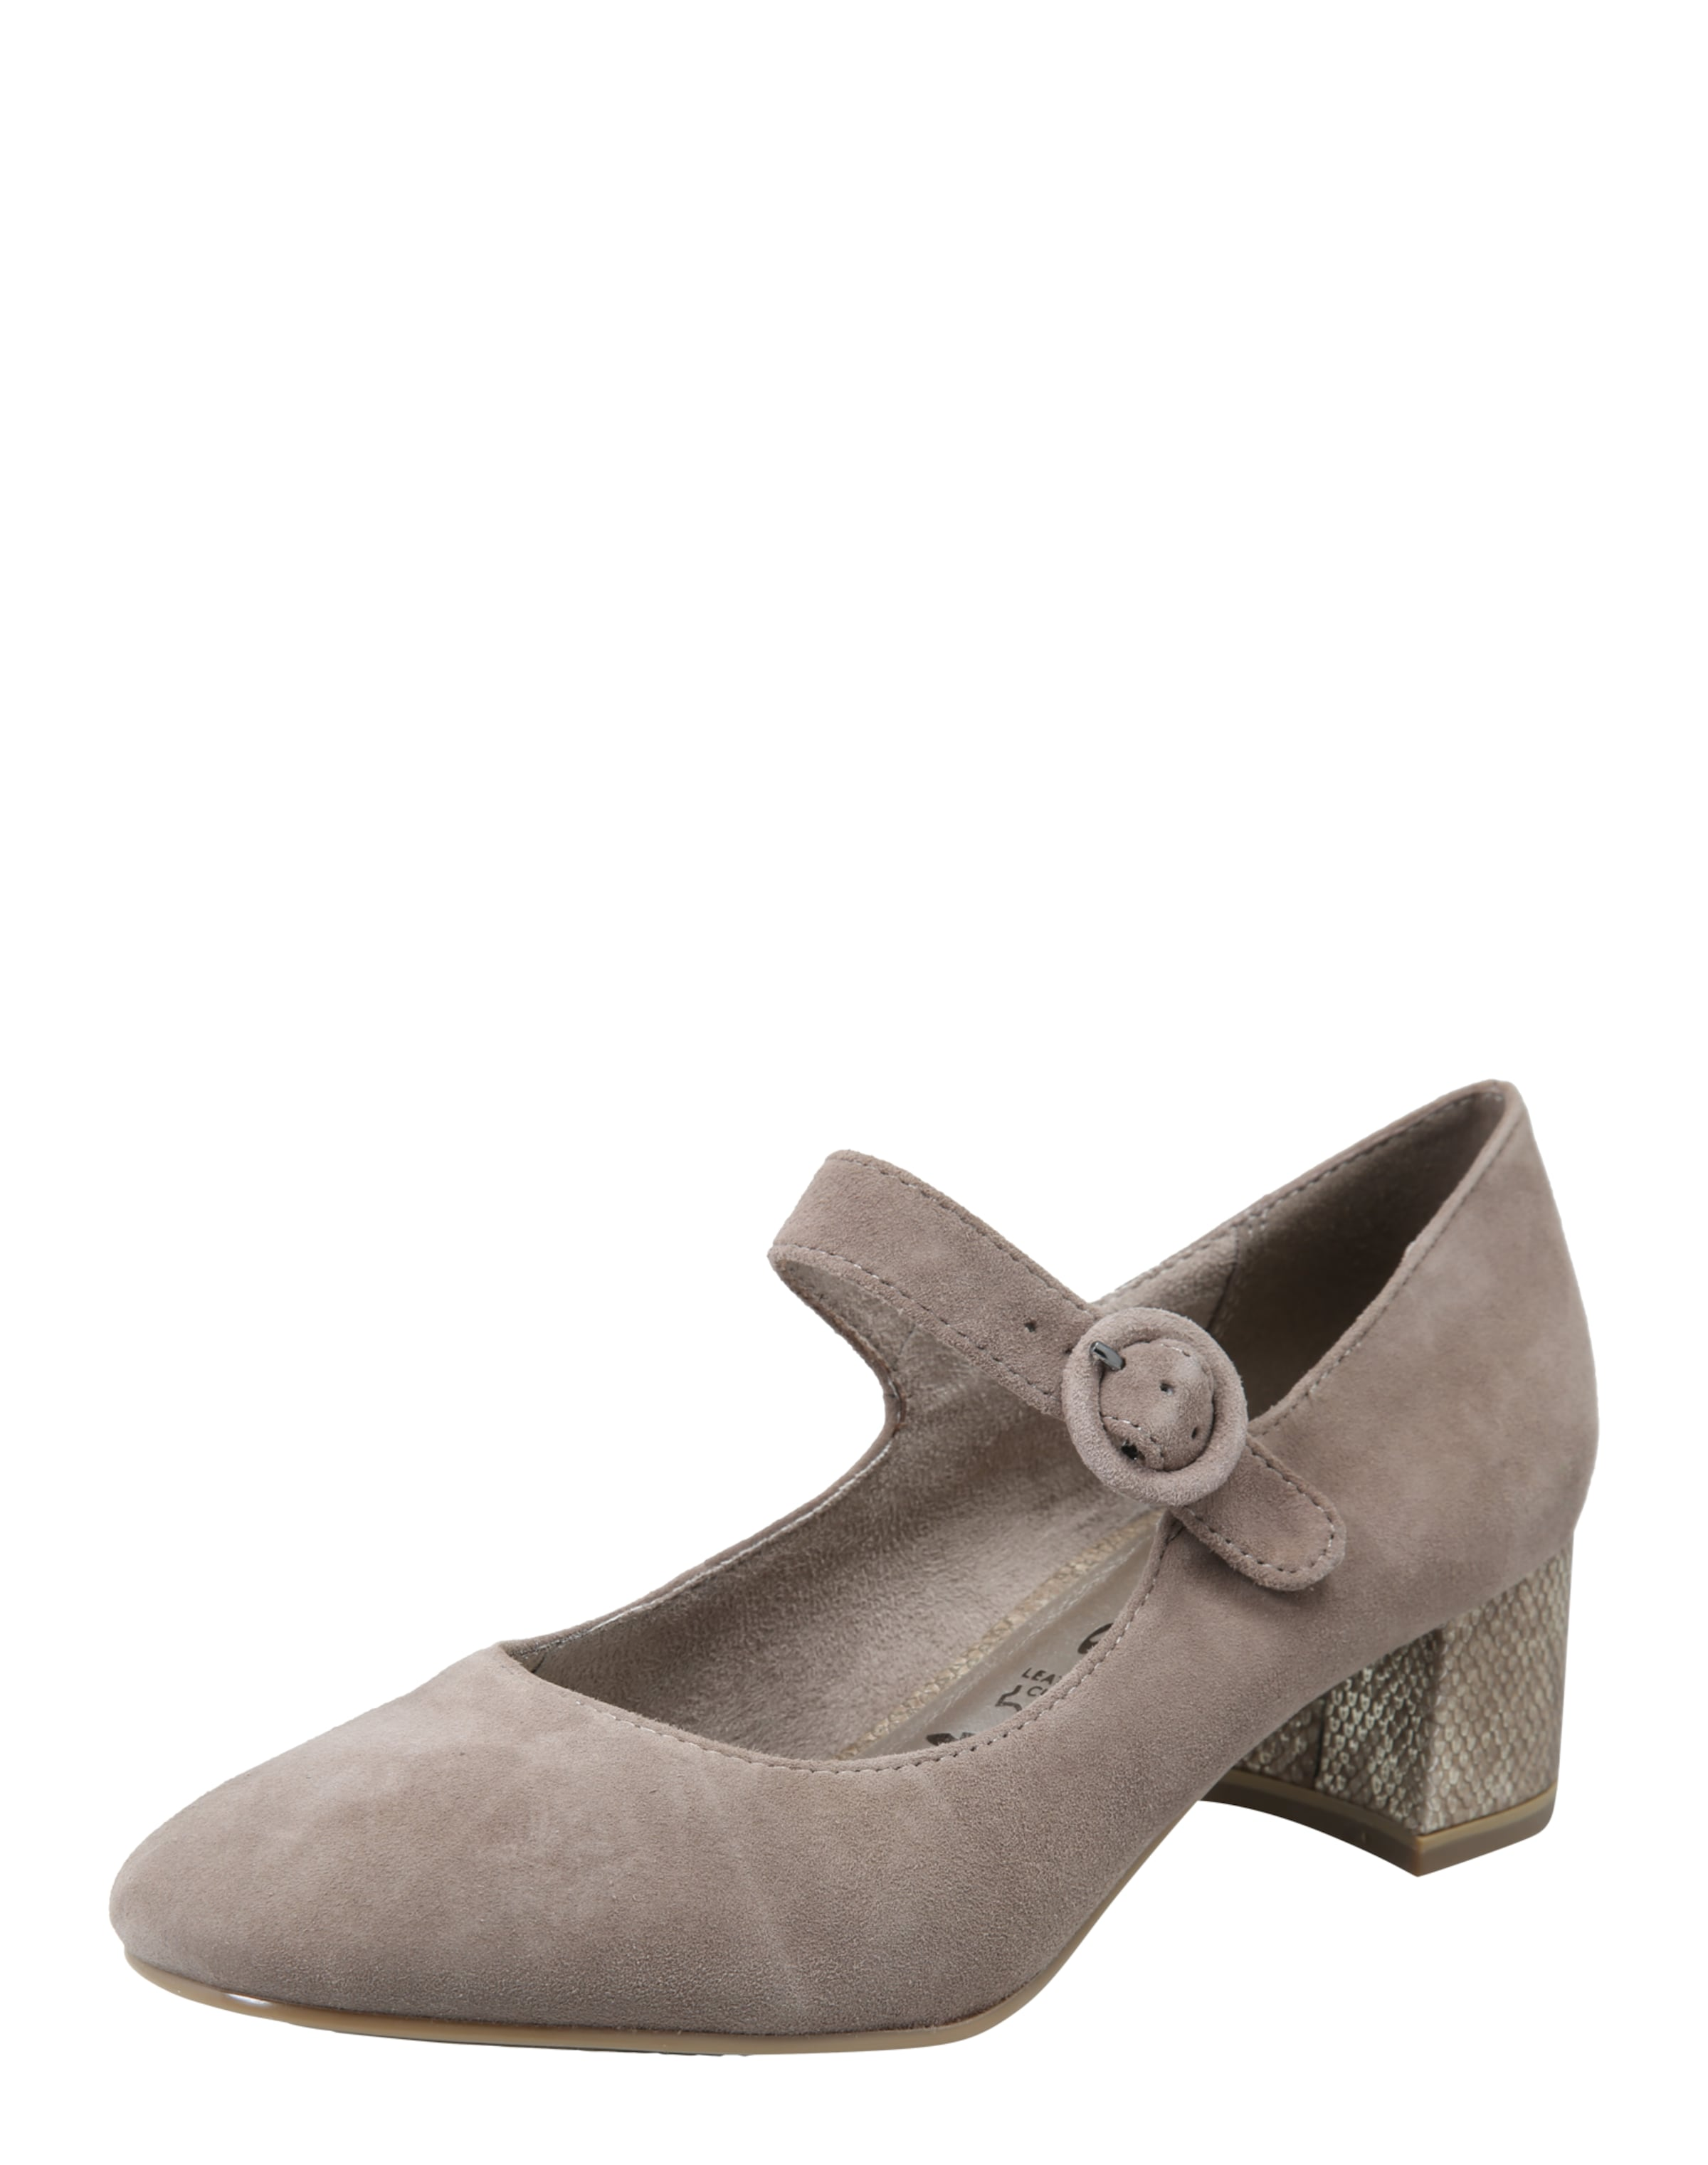 Haltbare Mode billige Schuhe TAMARIS | Pumps 'Alida' Schuhe Gut getragene Schuhe